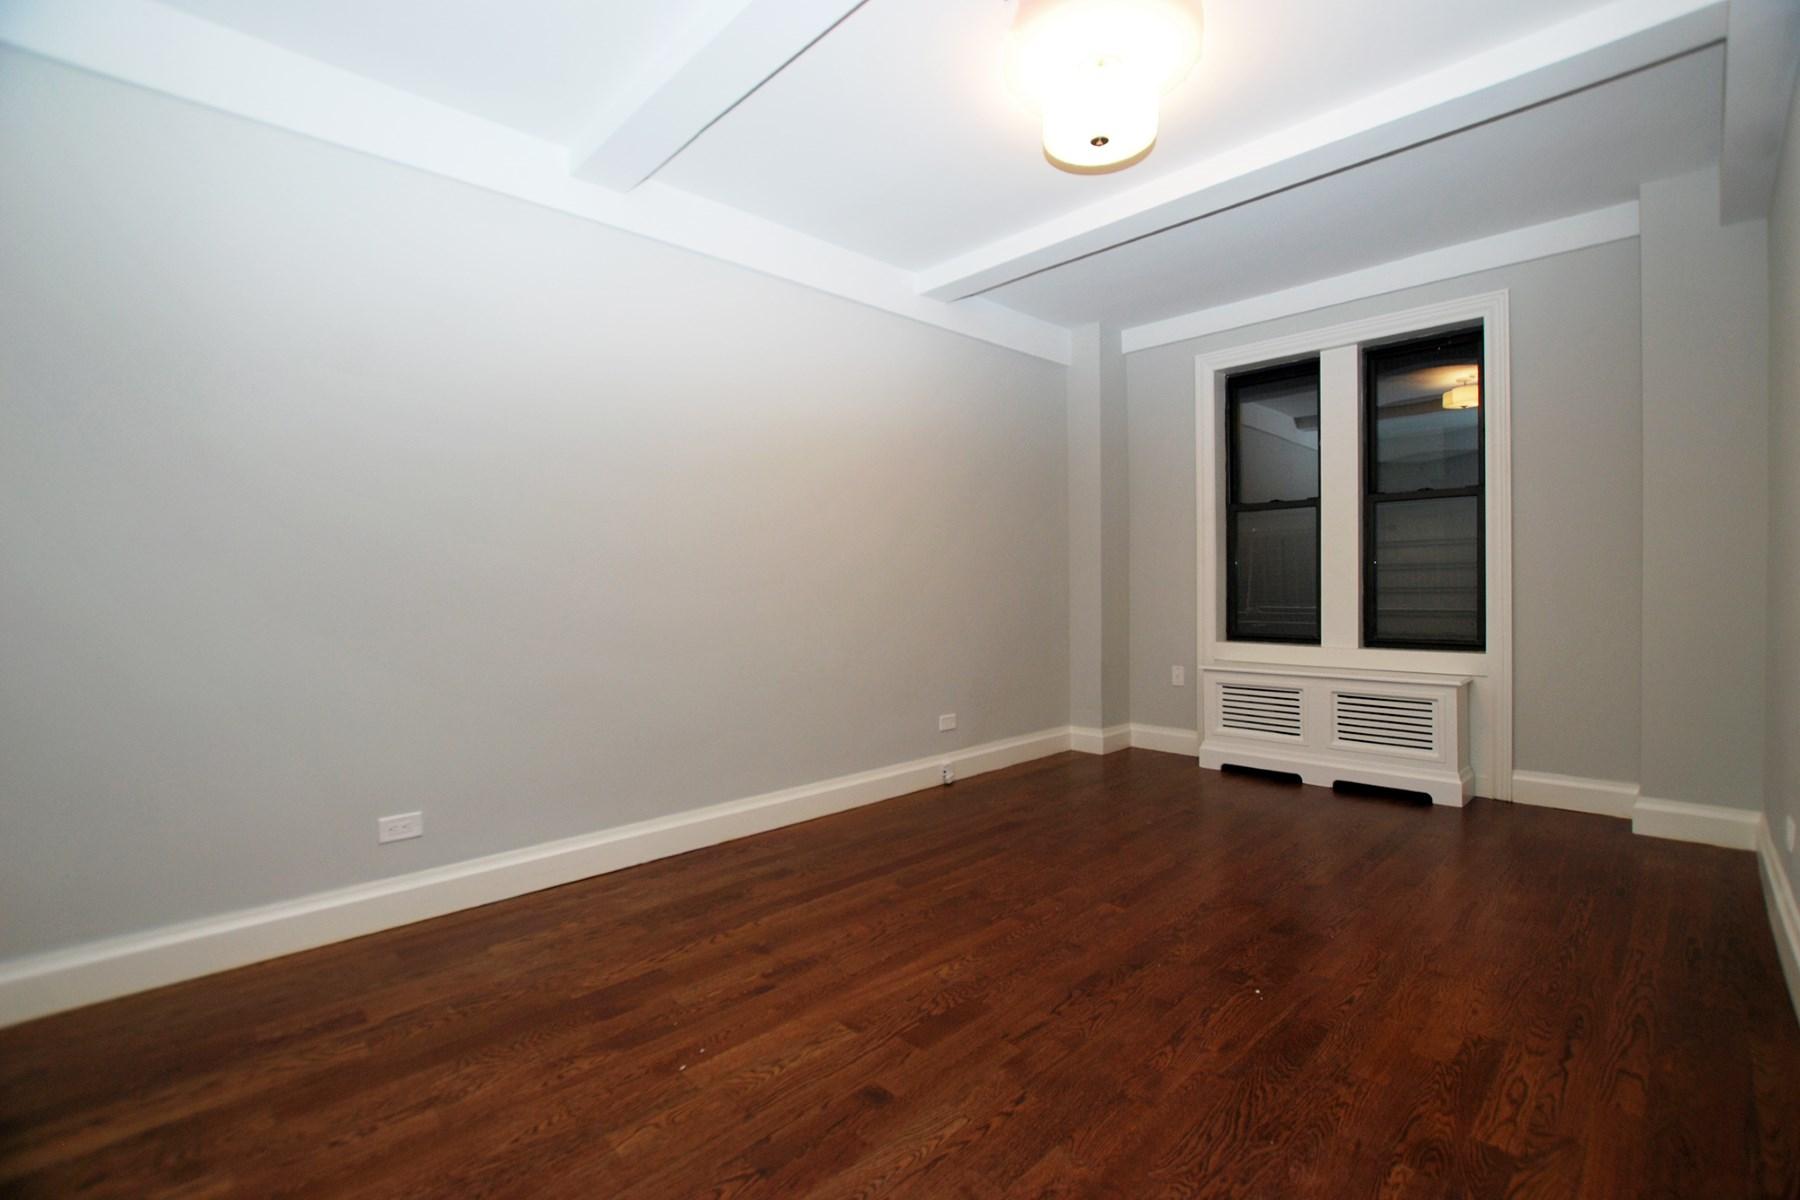 Property Of 451 West End Avenue, Apt. 9F